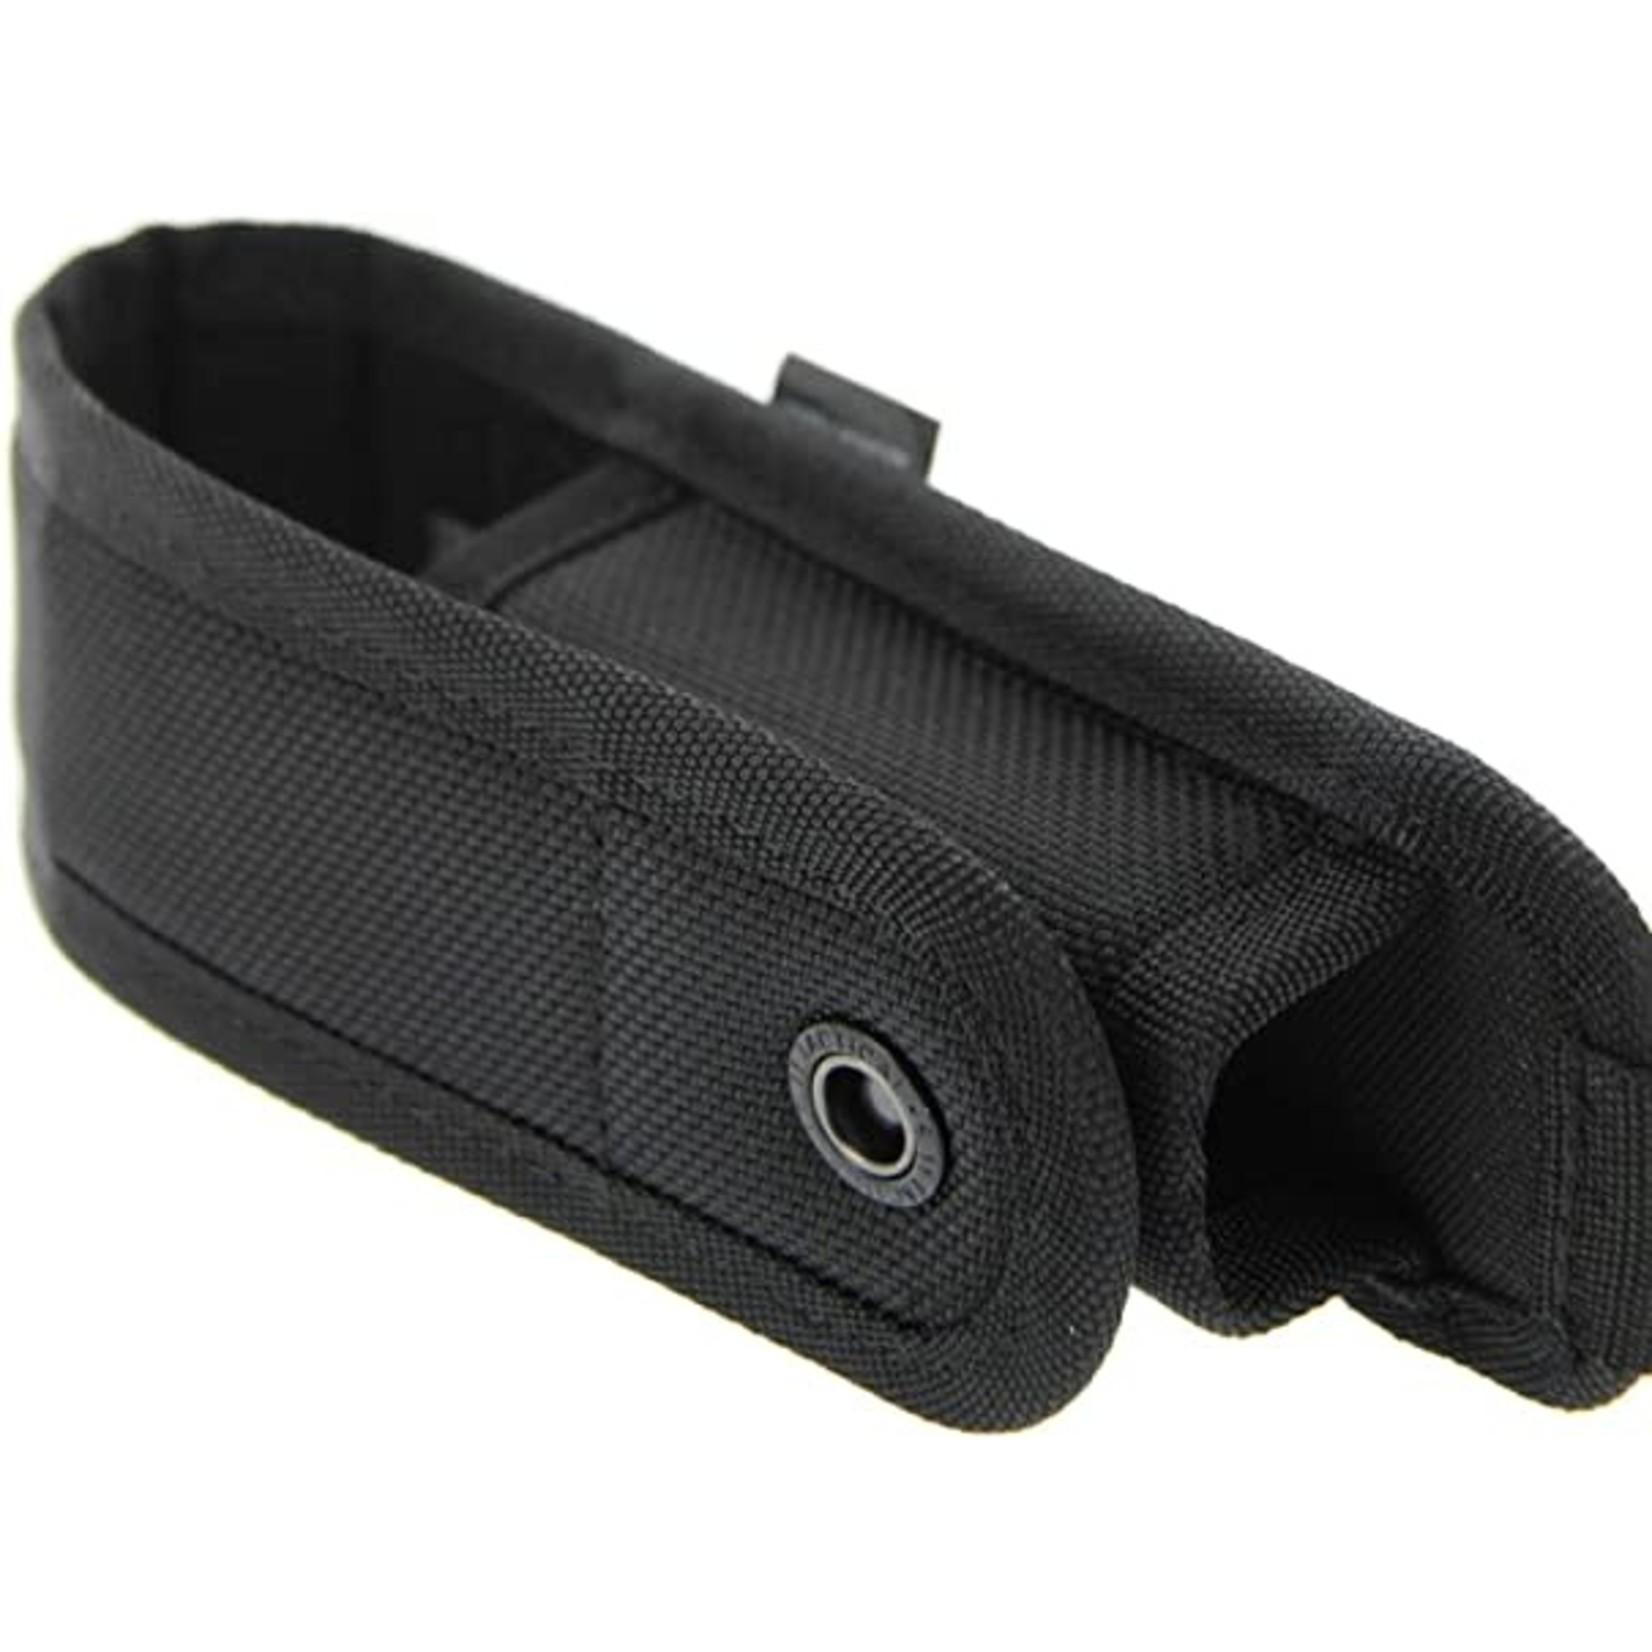 5.11 Tactical 5.11 XR Series Flashlight Holster